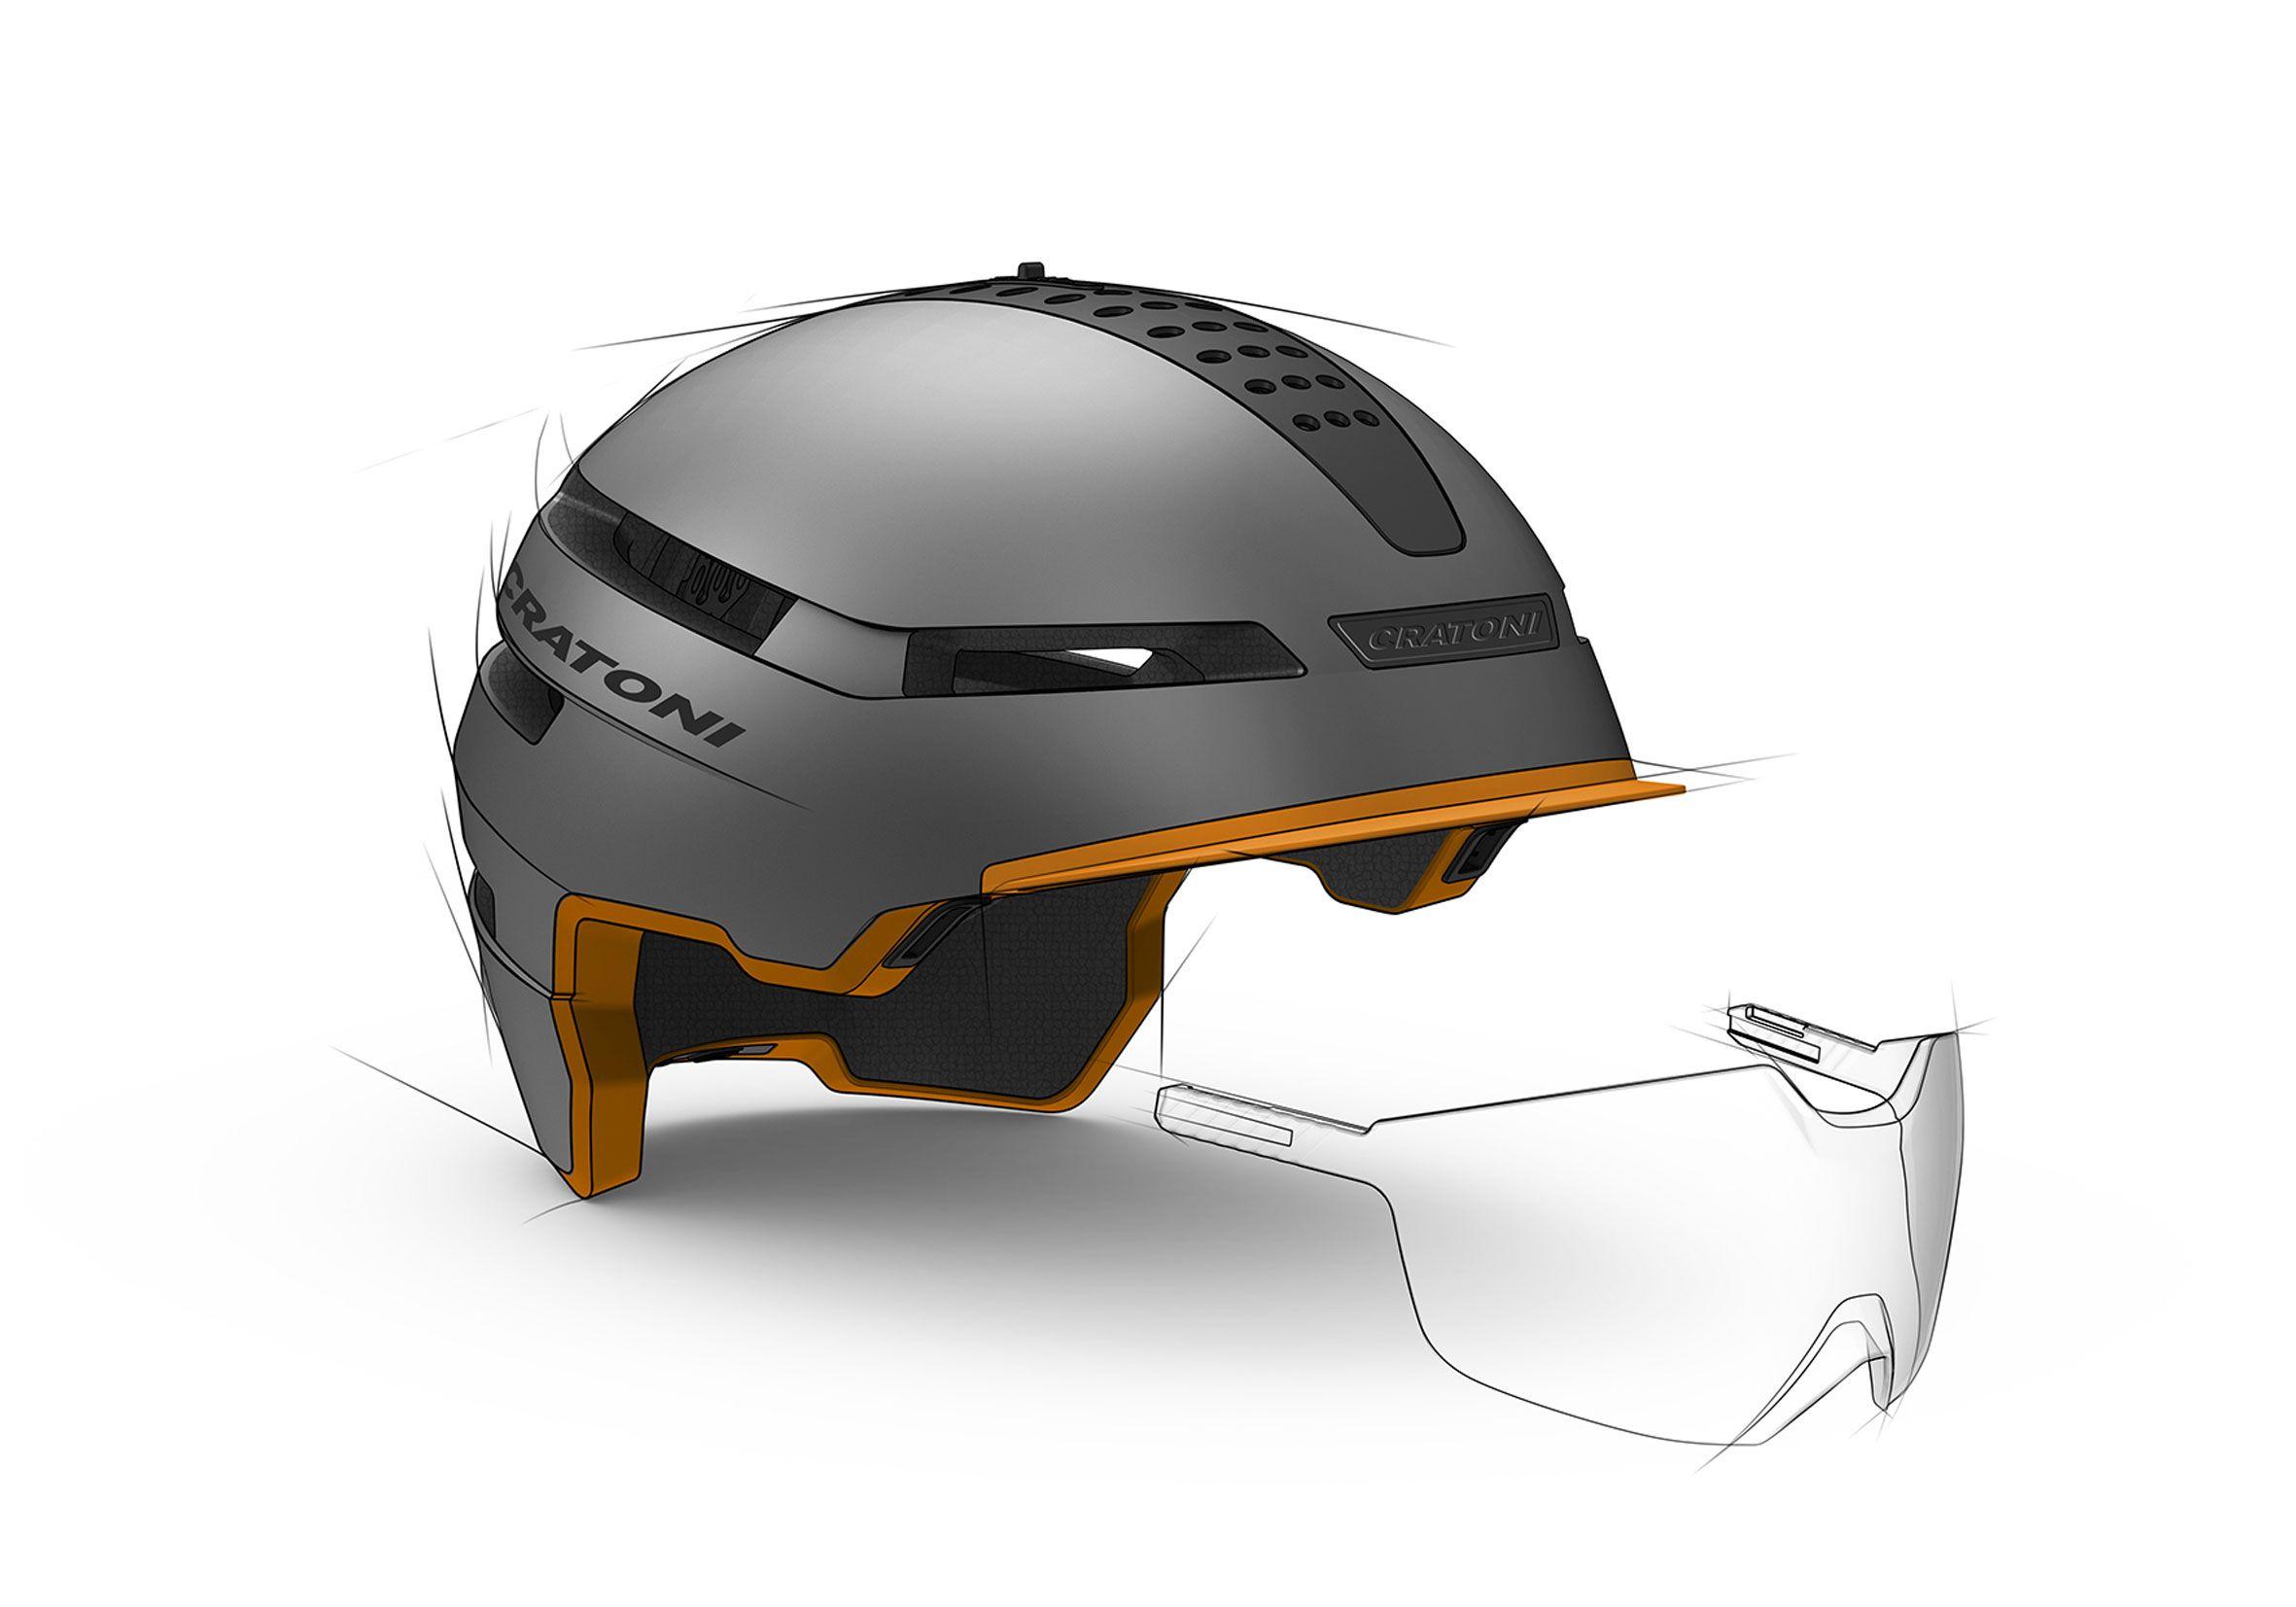 cratoni helme und sportbrillen f r e bike und s pedelec. Black Bedroom Furniture Sets. Home Design Ideas